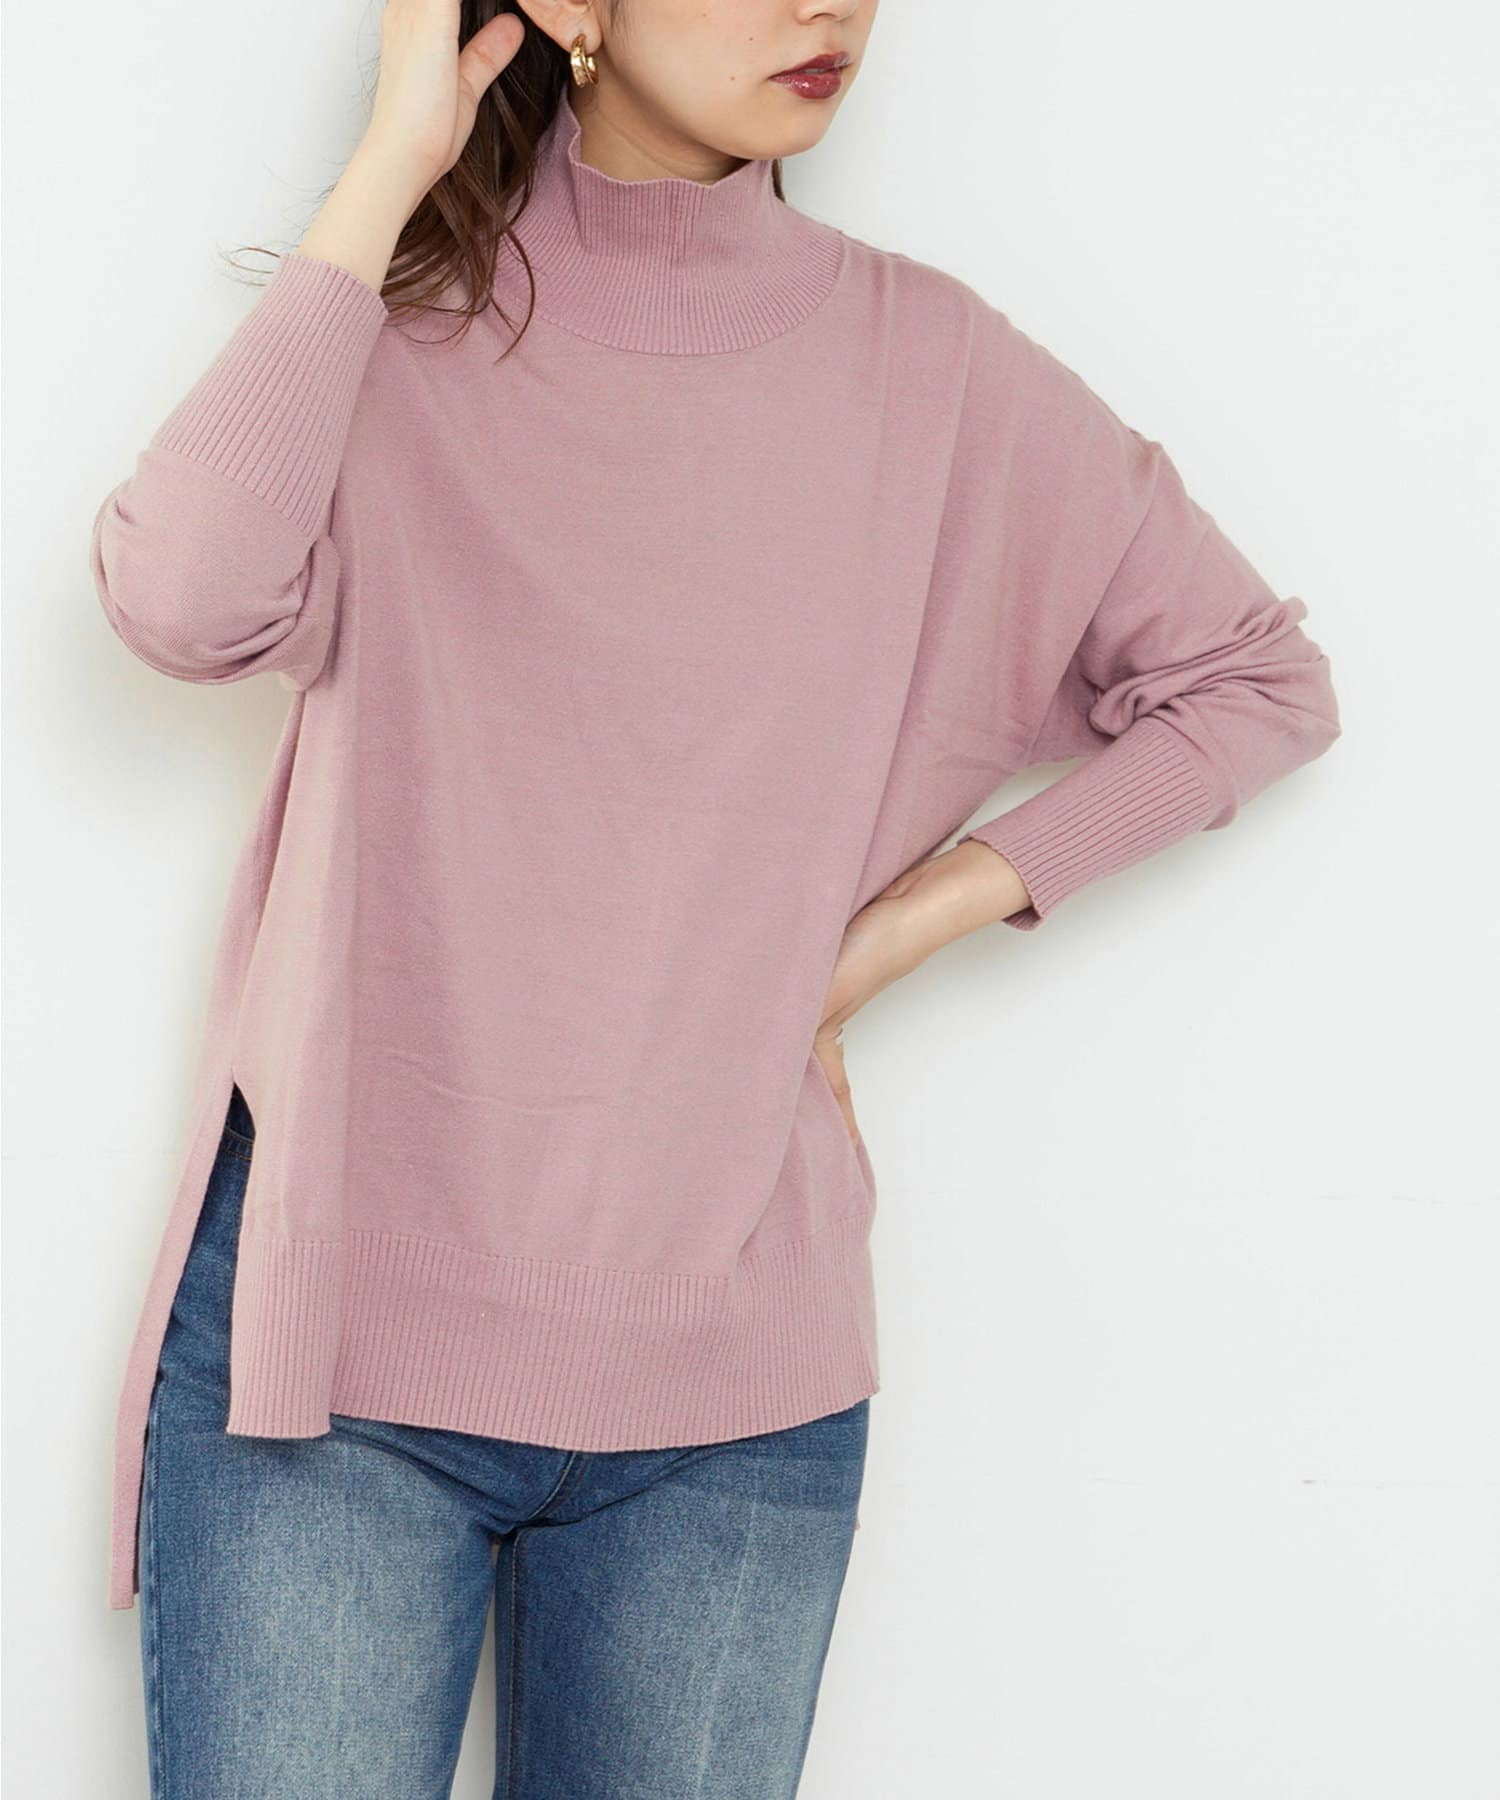 natural couture(ナチュラルクチュール) レディース 【大好評リバイバルアイテム】もちもちゆるっとハイネックニット ピンク